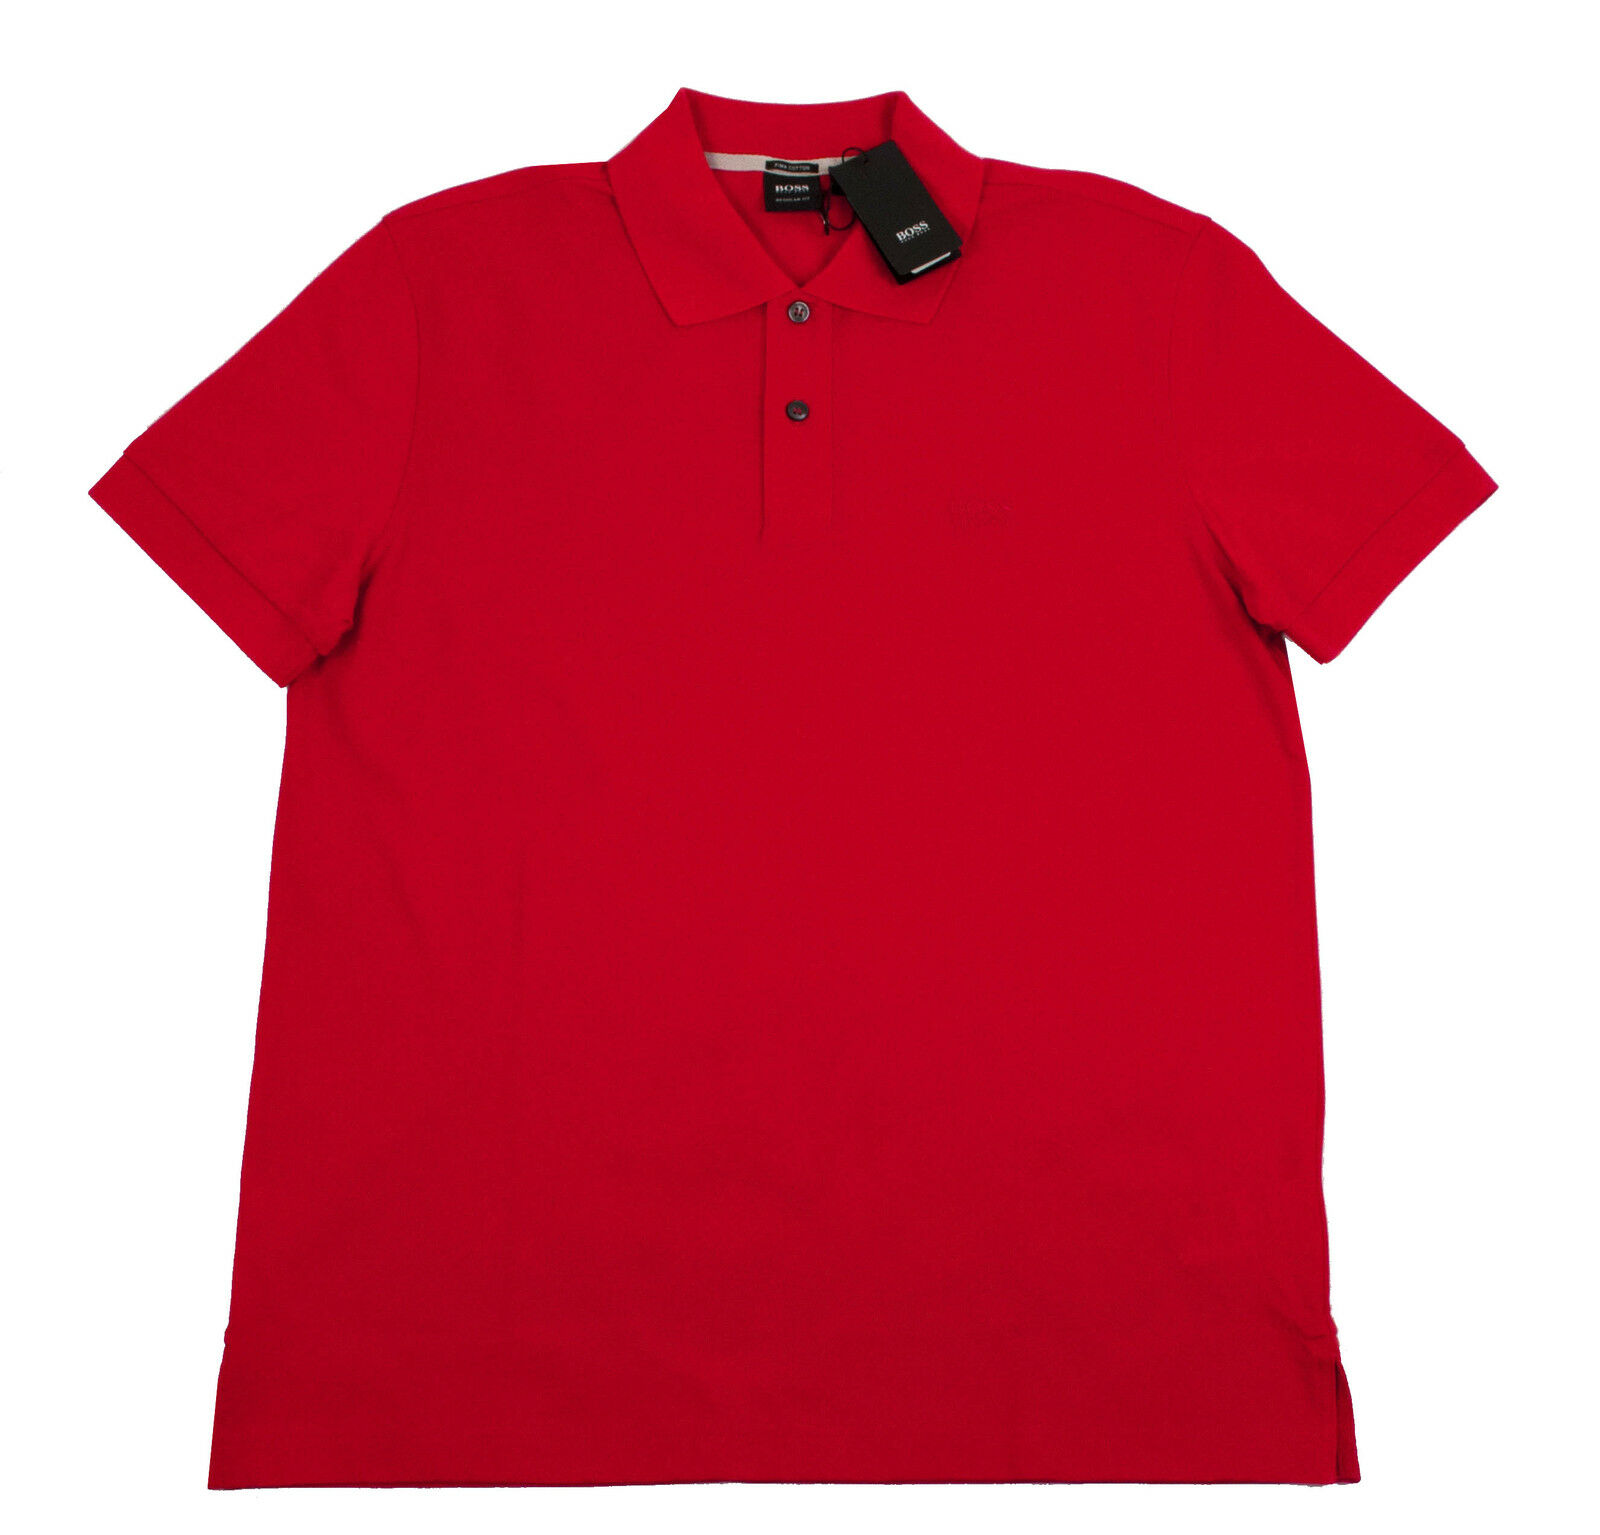 M, XL HUGO BOSS FIRENZE LOGO REGULAR FIT Pour des hommes rouge COTTON engrener manche courte SHIRT